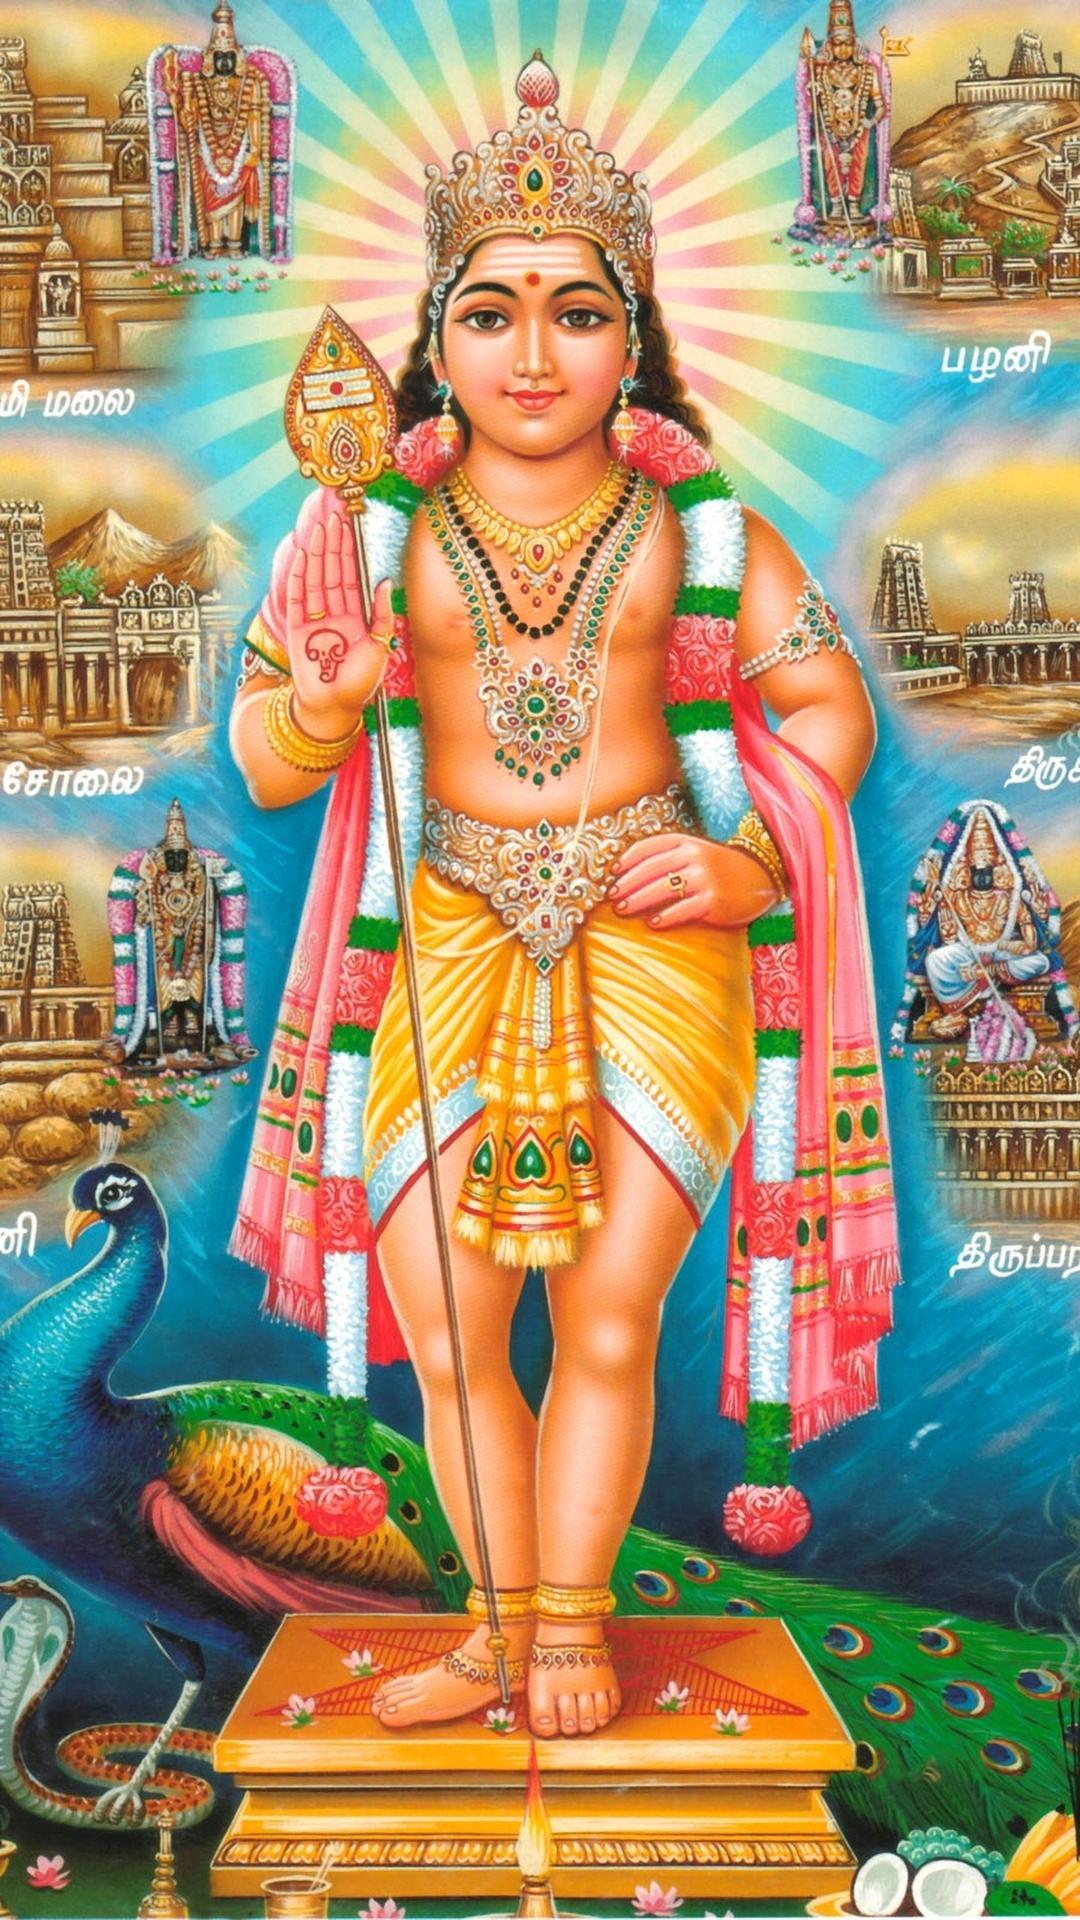 Hindu God Wallpaper Hd For Mobile - Hindu God Wallpaper Hd For Mobile Free Download , HD Wallpaper & Backgrounds